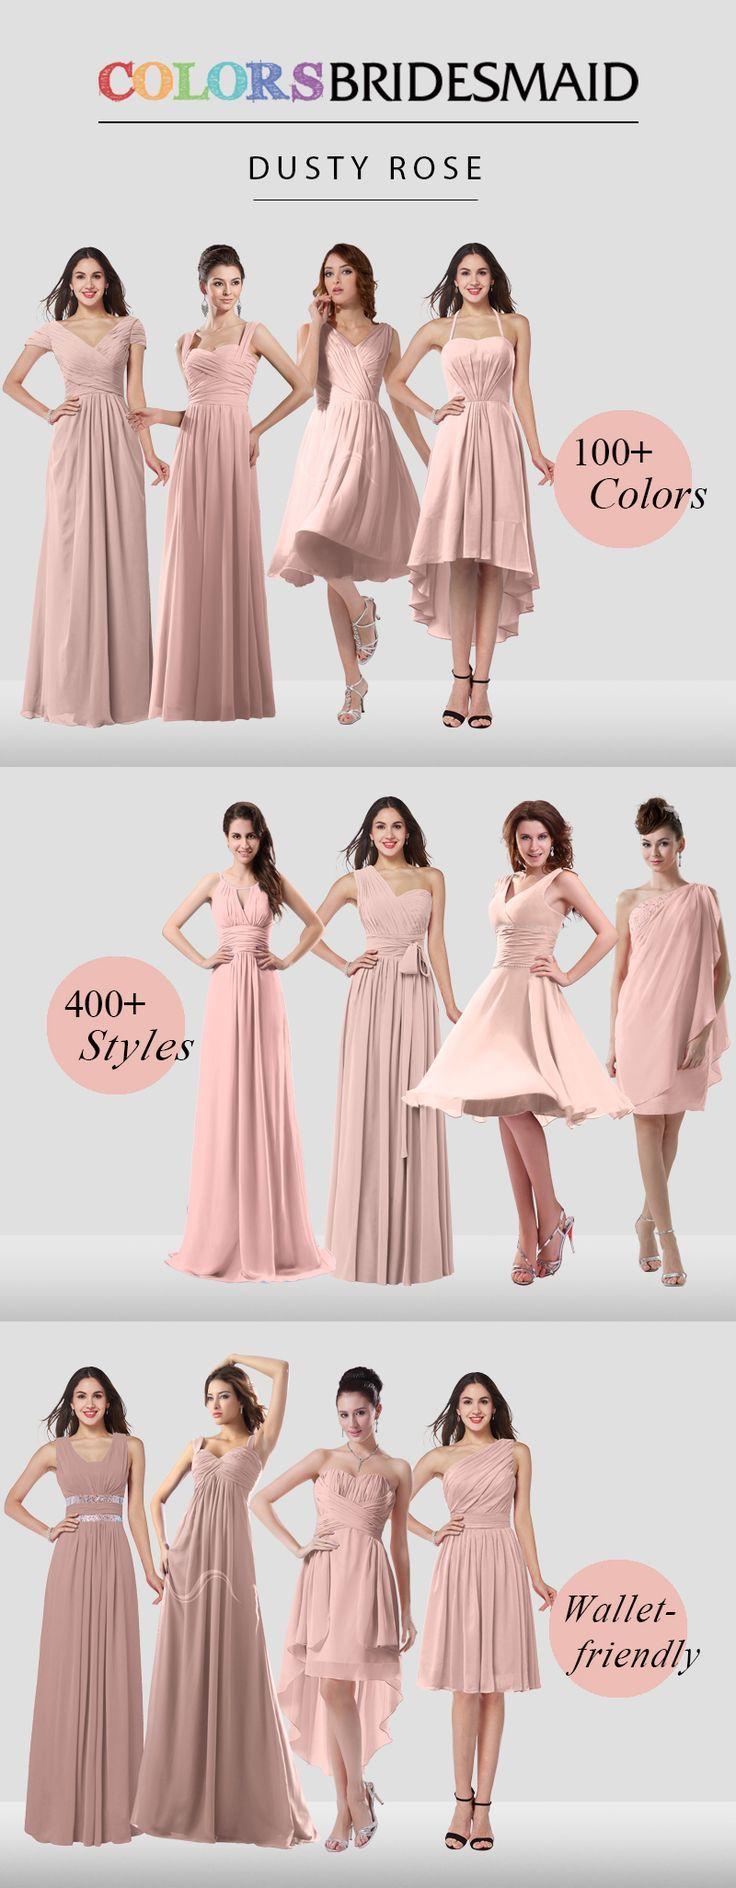 ColorsBridesmaidDusty Rose Bridesmaid Dresses – Trendy Wedding Dresses